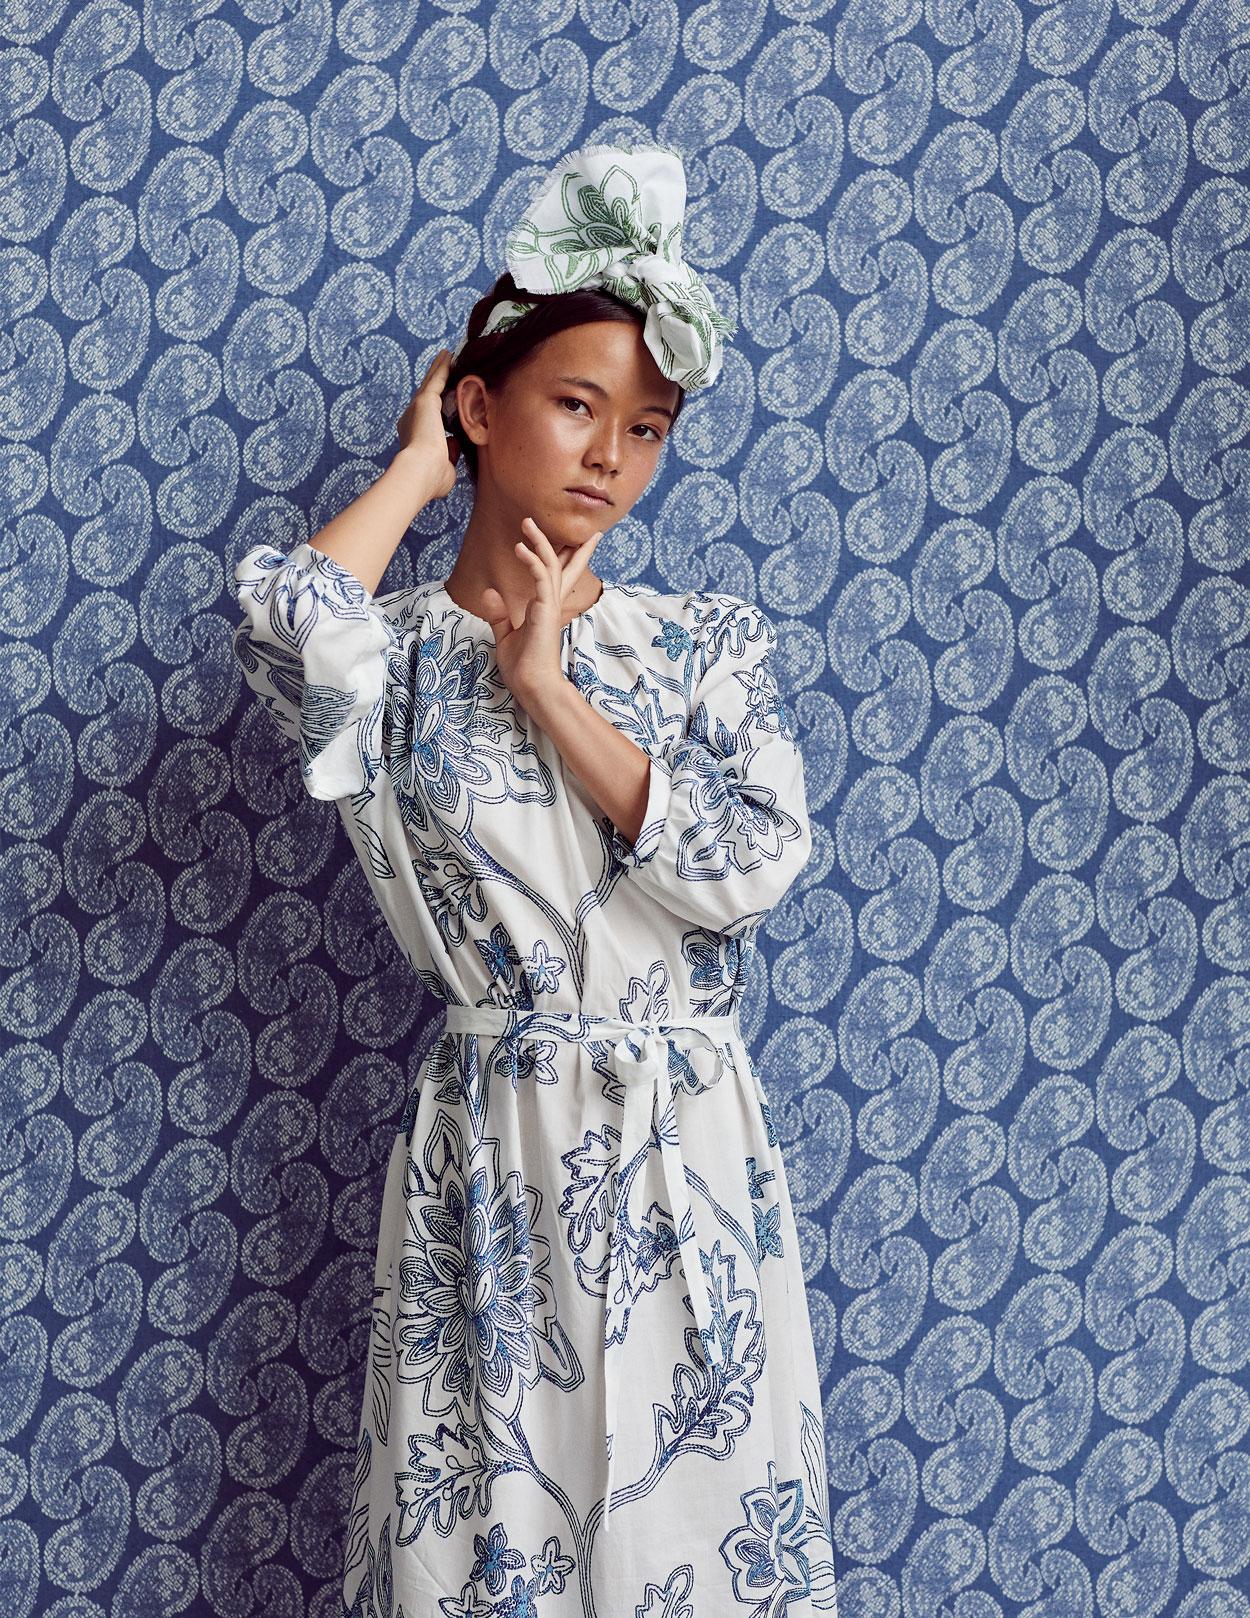 Wallpaper - Worn Paisley reverse in denim :: Fabric - Maharini's Garden in royal blue, custom printed on cotton poplin for this shoot.